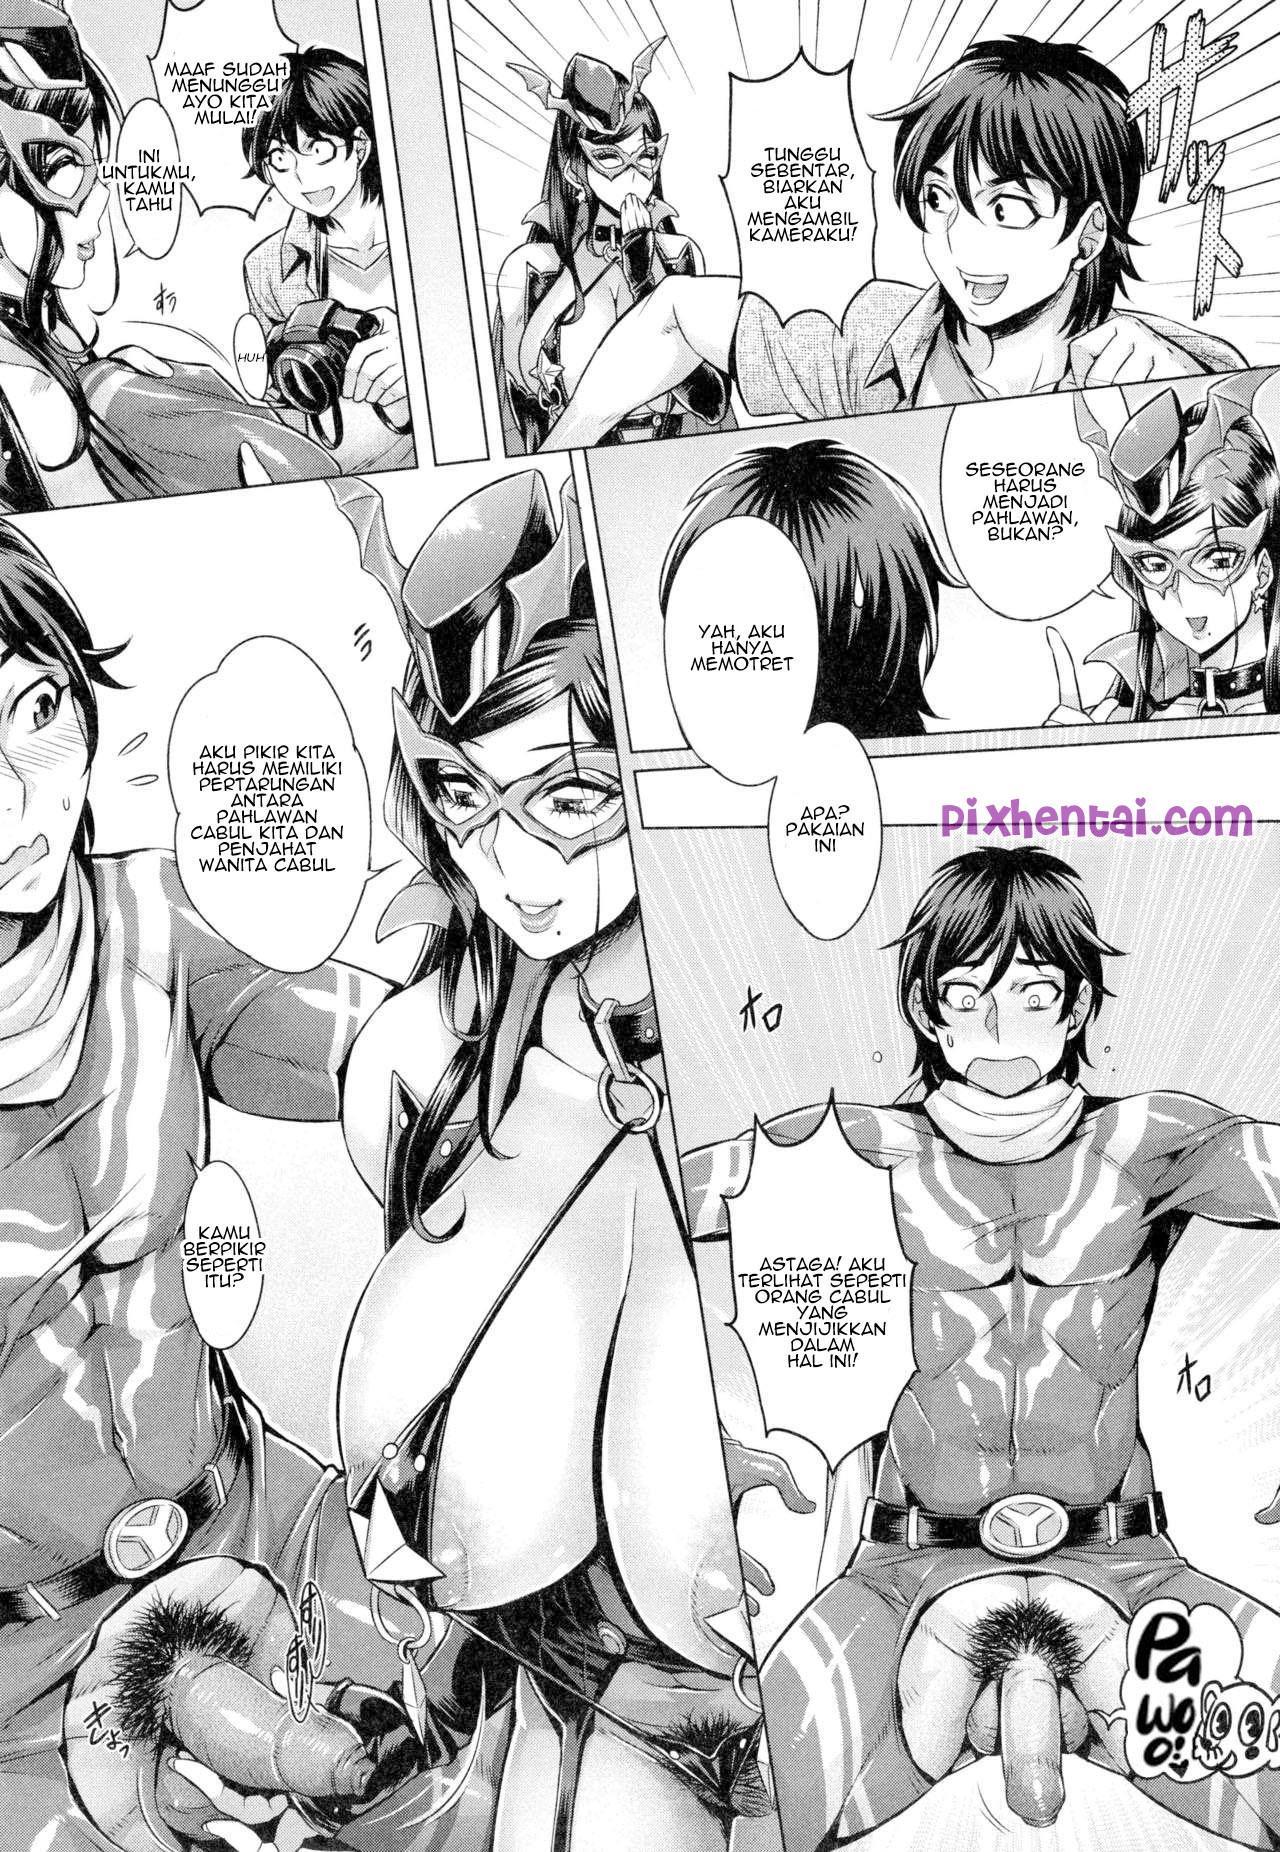 Komik hentai xxx manga sex bokep entot ibu kost saat cosplay 05